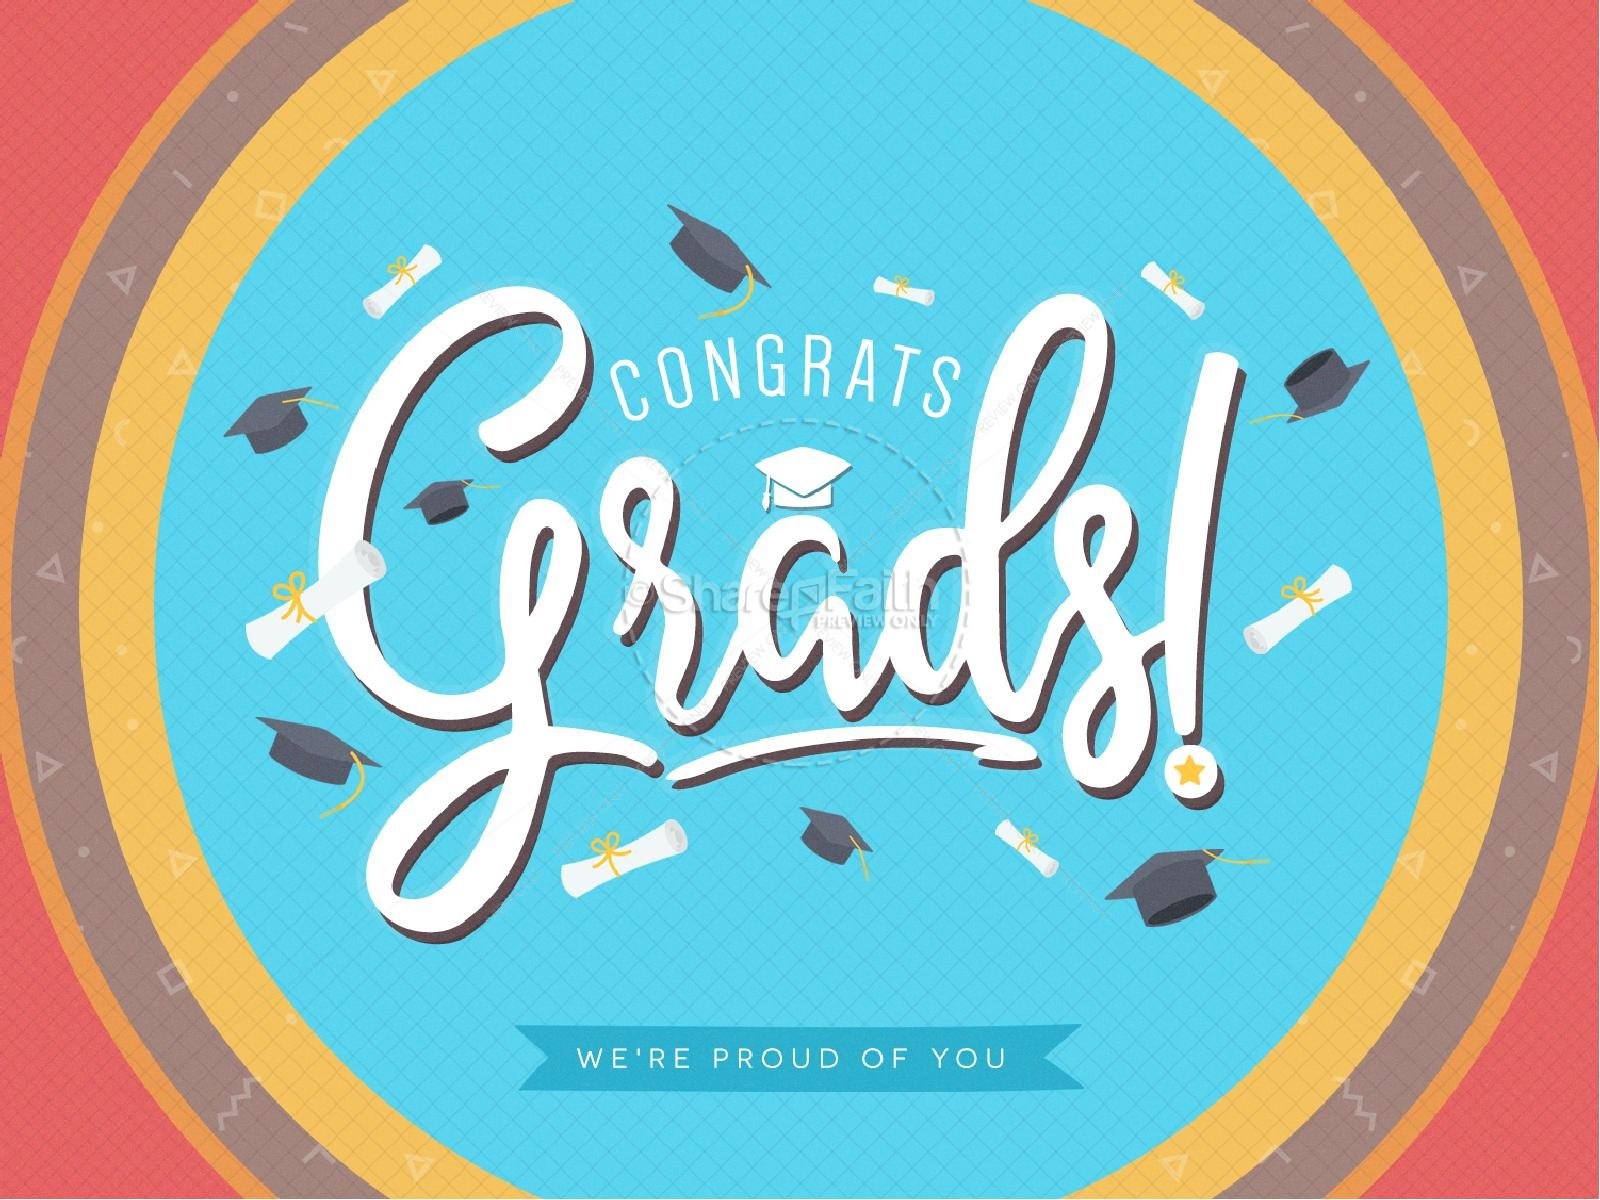 Congrats Grads Graduation PowerPoint Template | slide 1